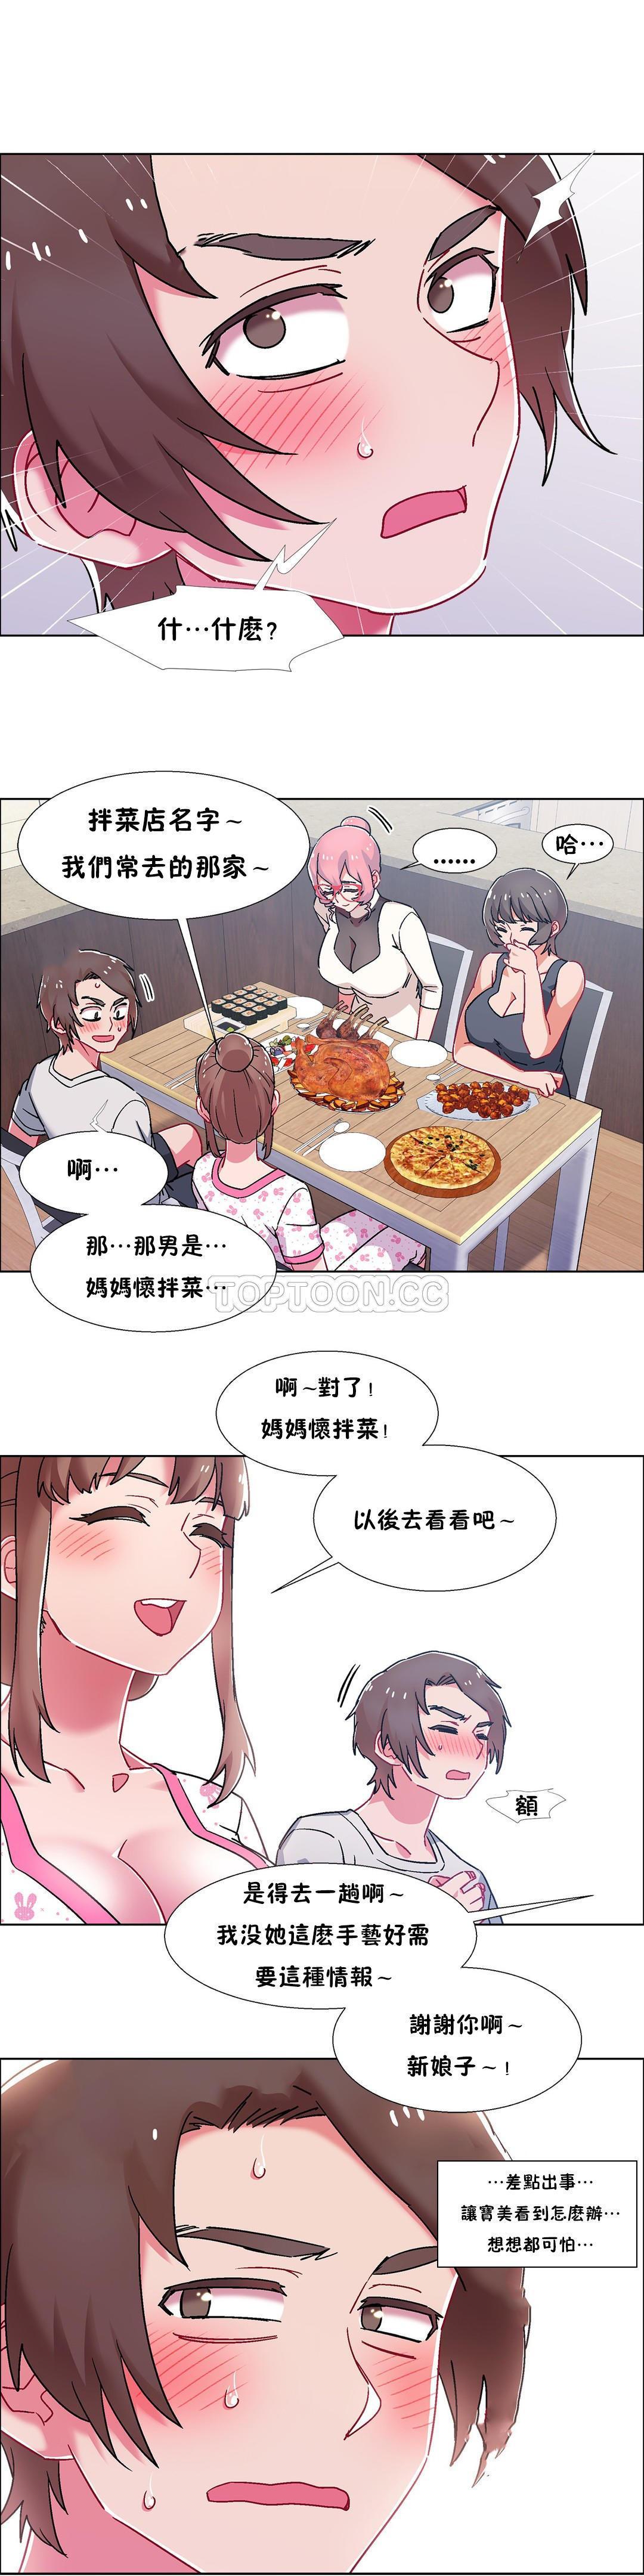 [Studio Wannabe] Rental Girls | 出租女郎 Ch. 33-58 [Chinese]  第二季 完结 520